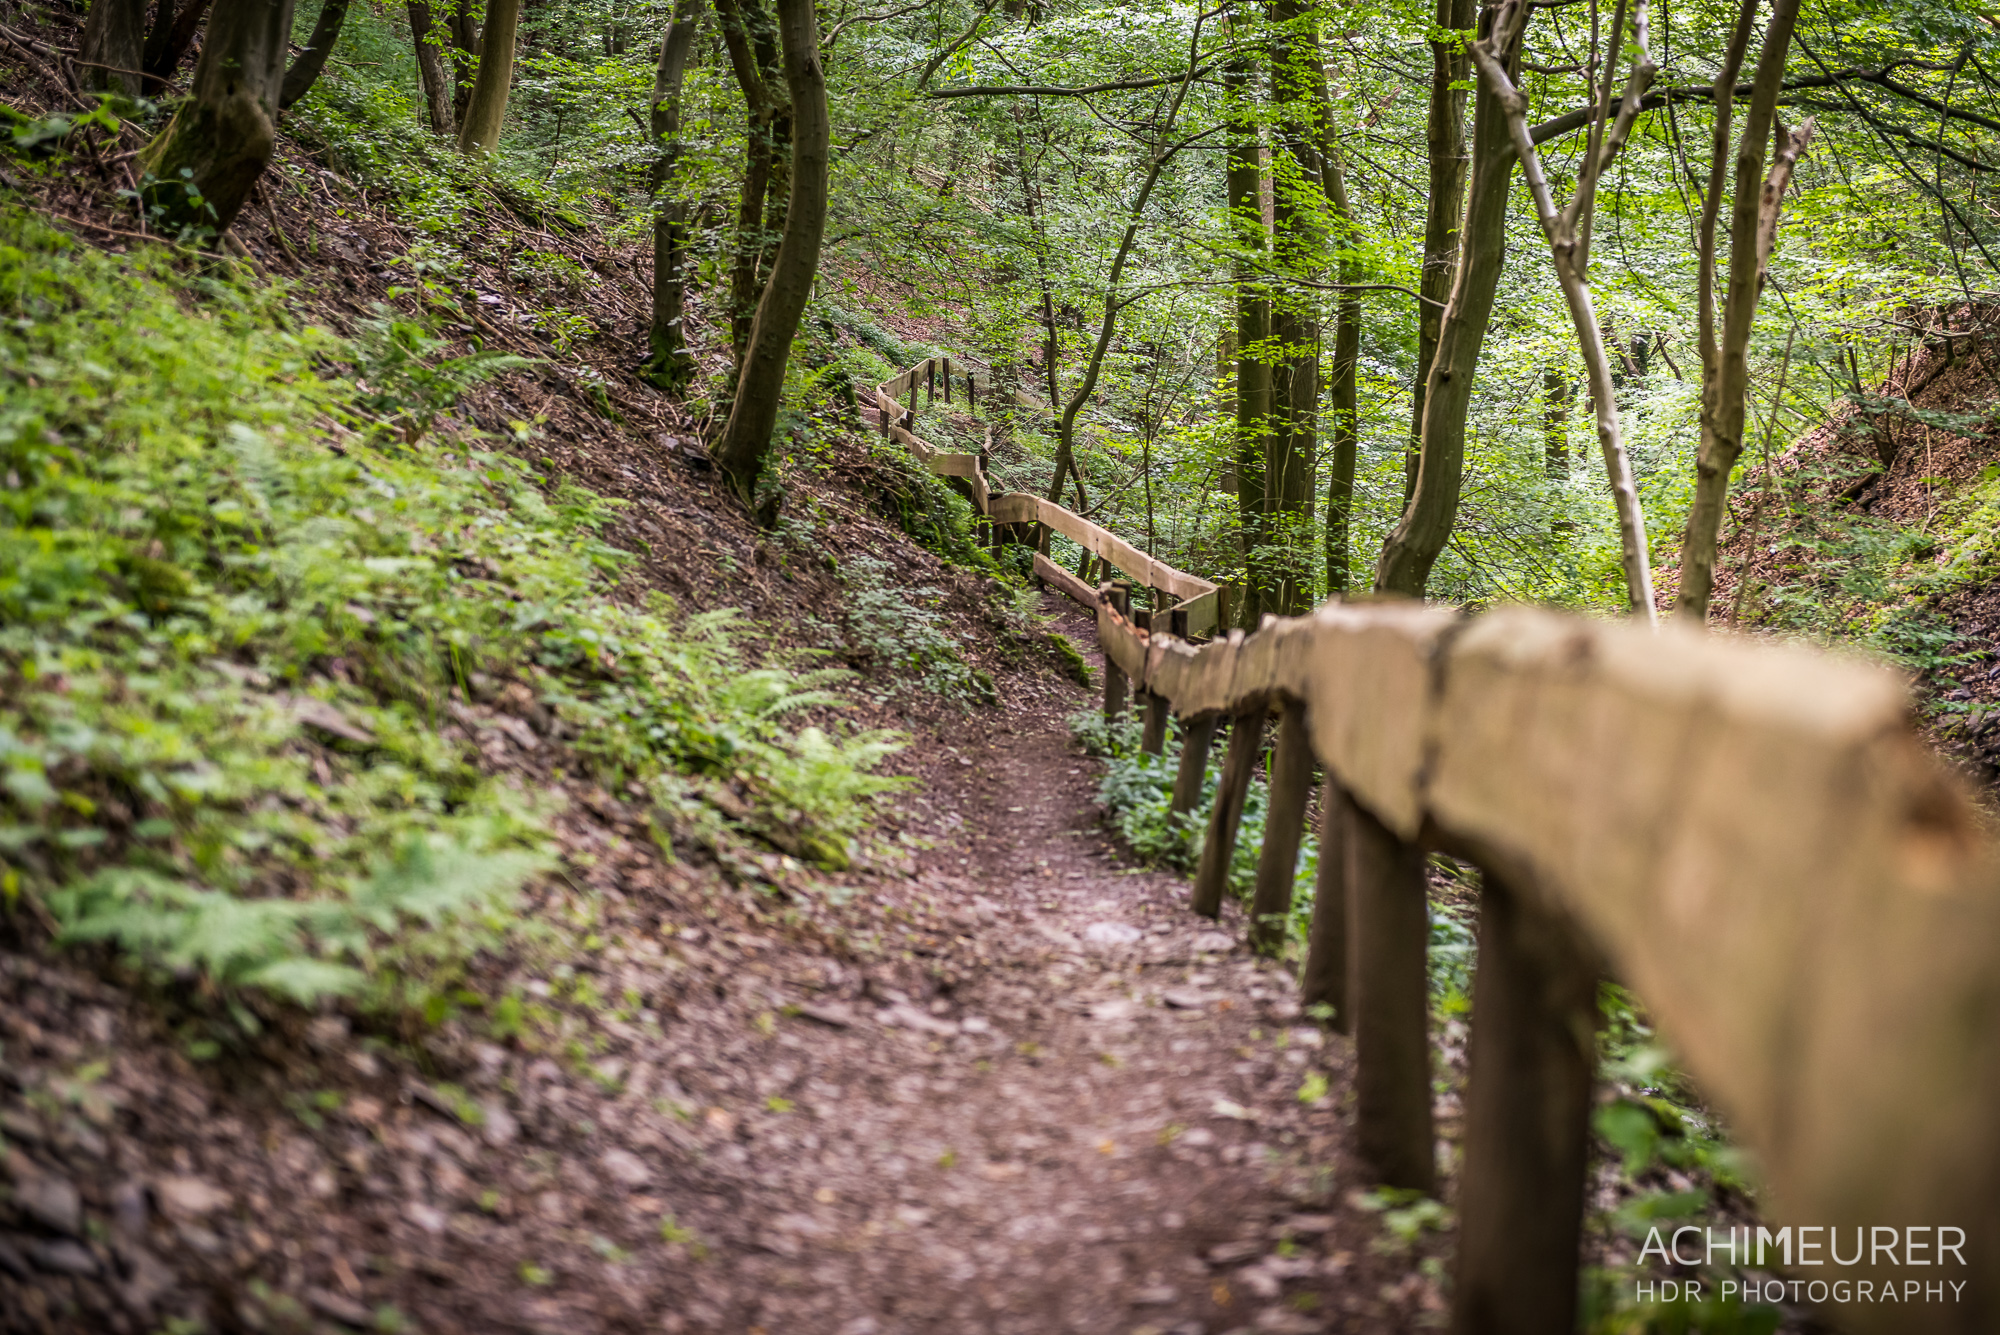 Eifel-Rheinland-Pfalz-Rureifel_5451